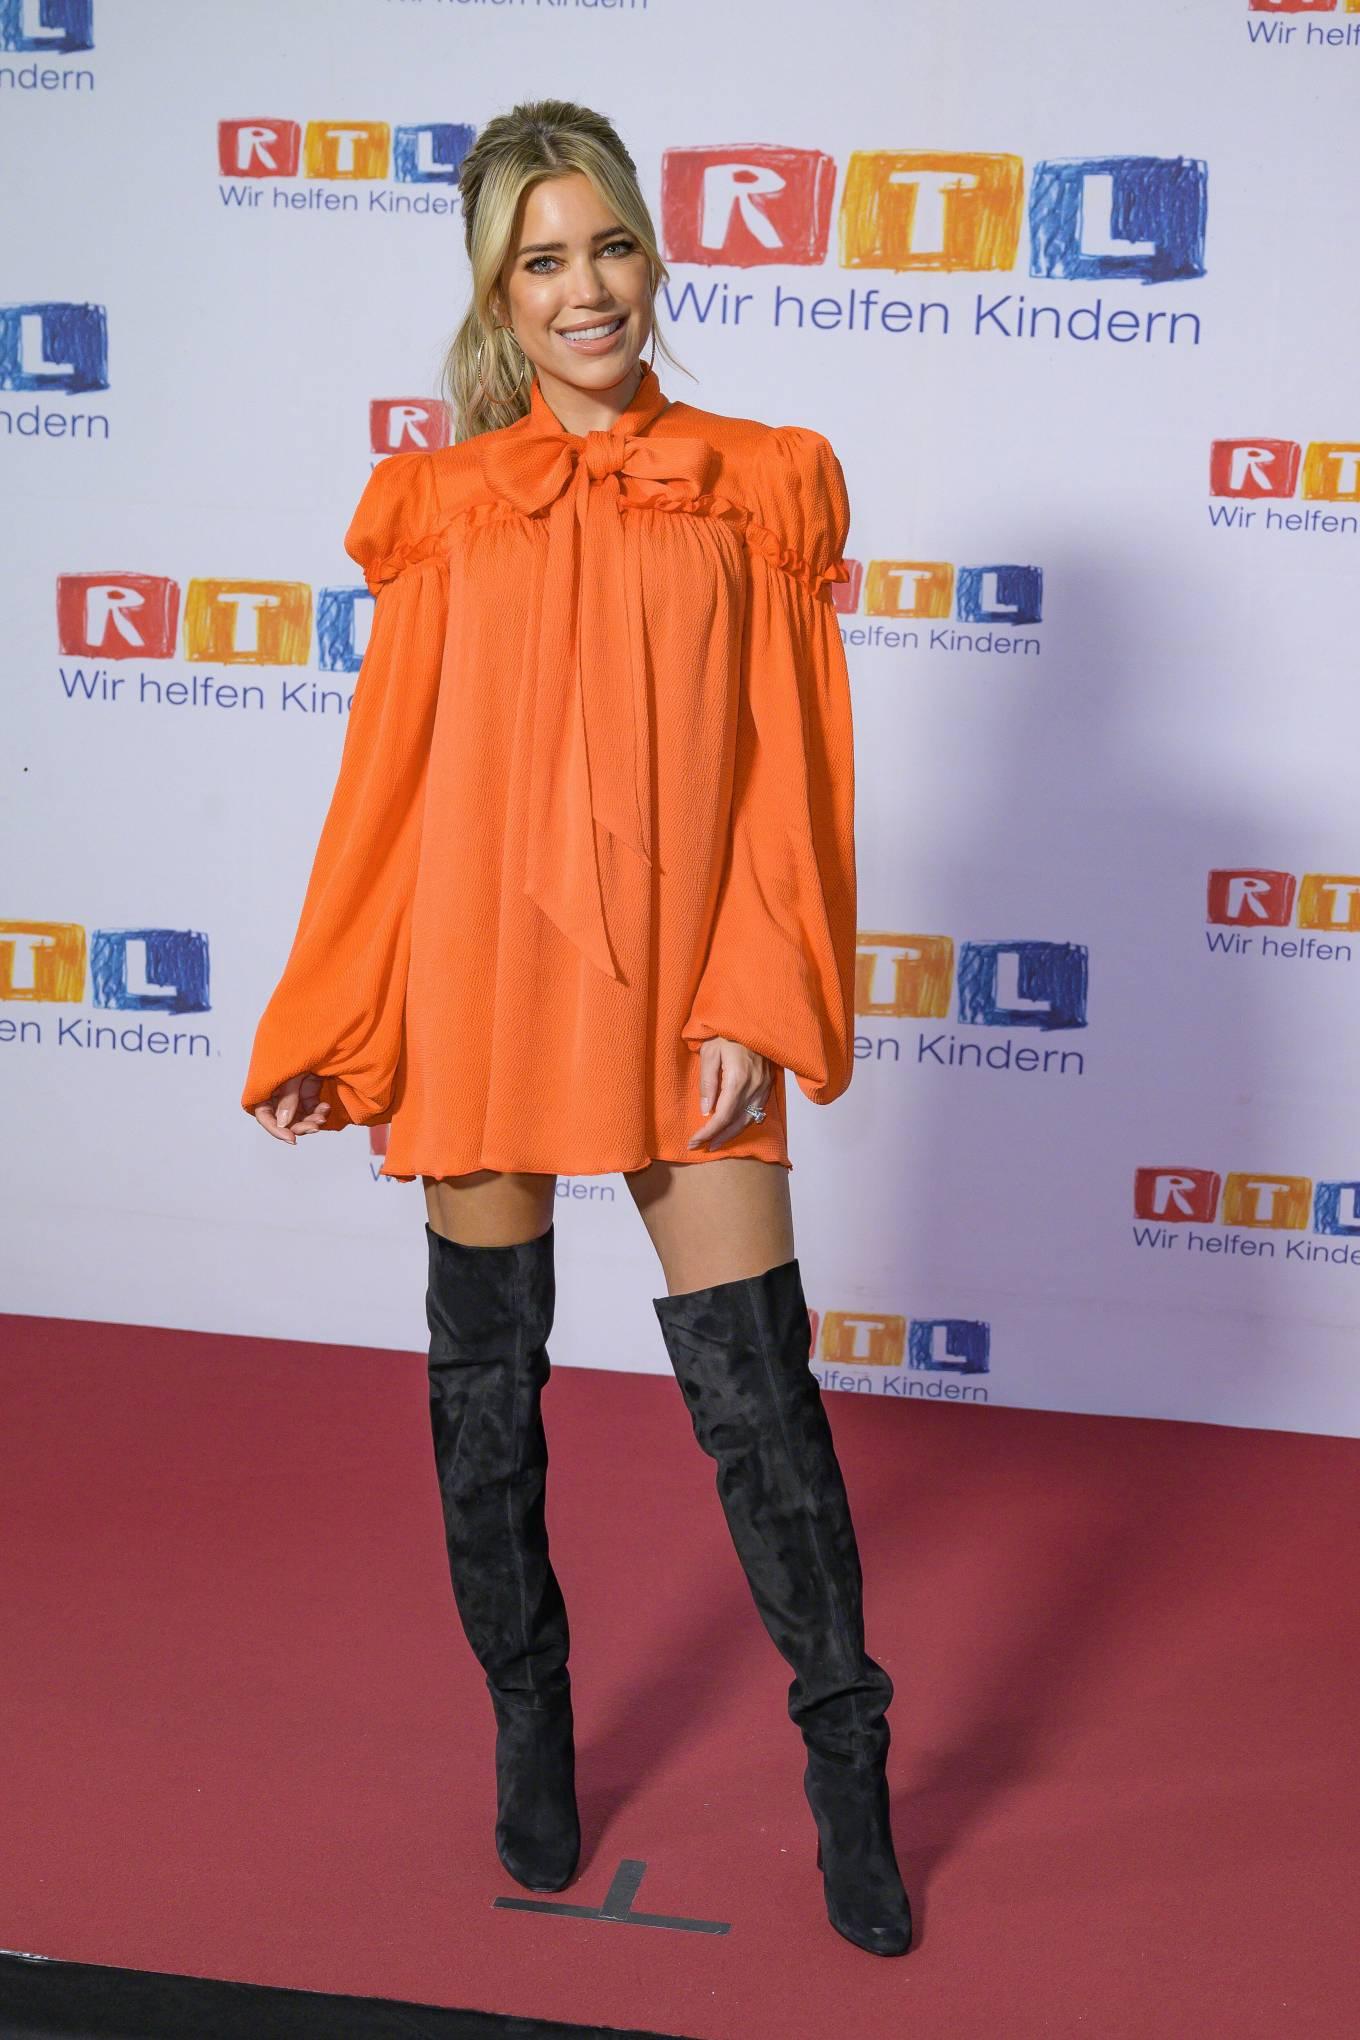 Sylvie Meis 2020 : Sylvie Meis – Red carpet at 2020 RTL Telethon in Huerth-06